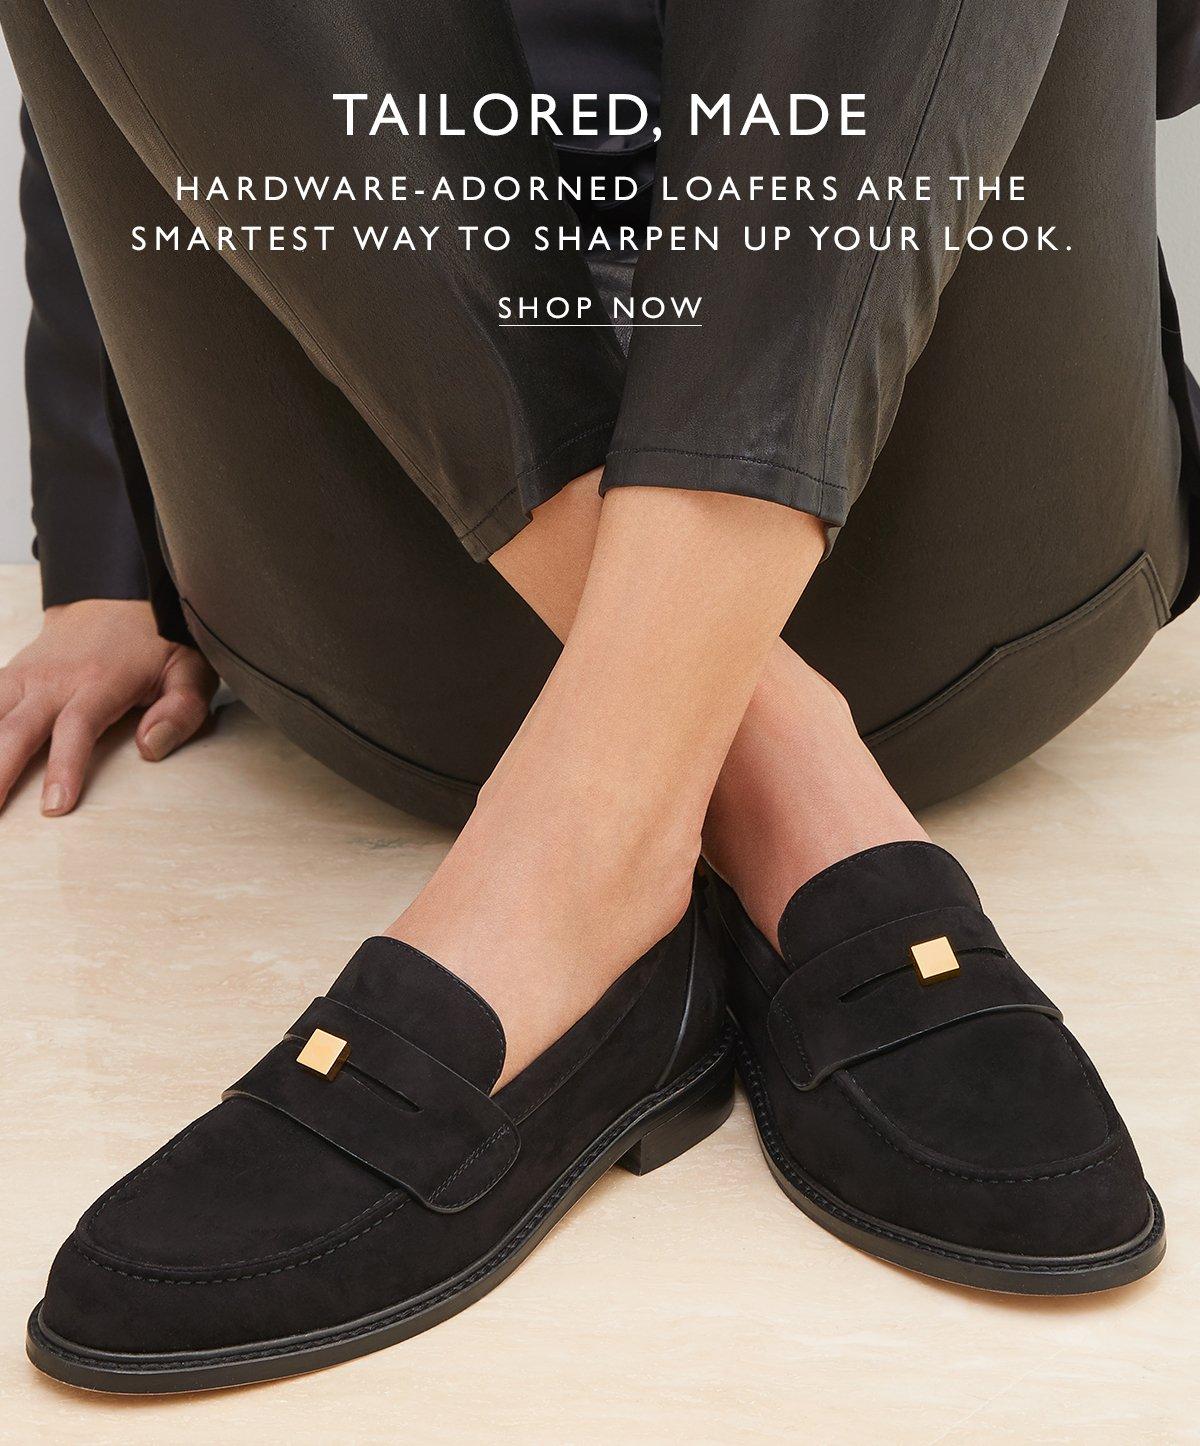 Stuart Weitzman: Looking for Loafers